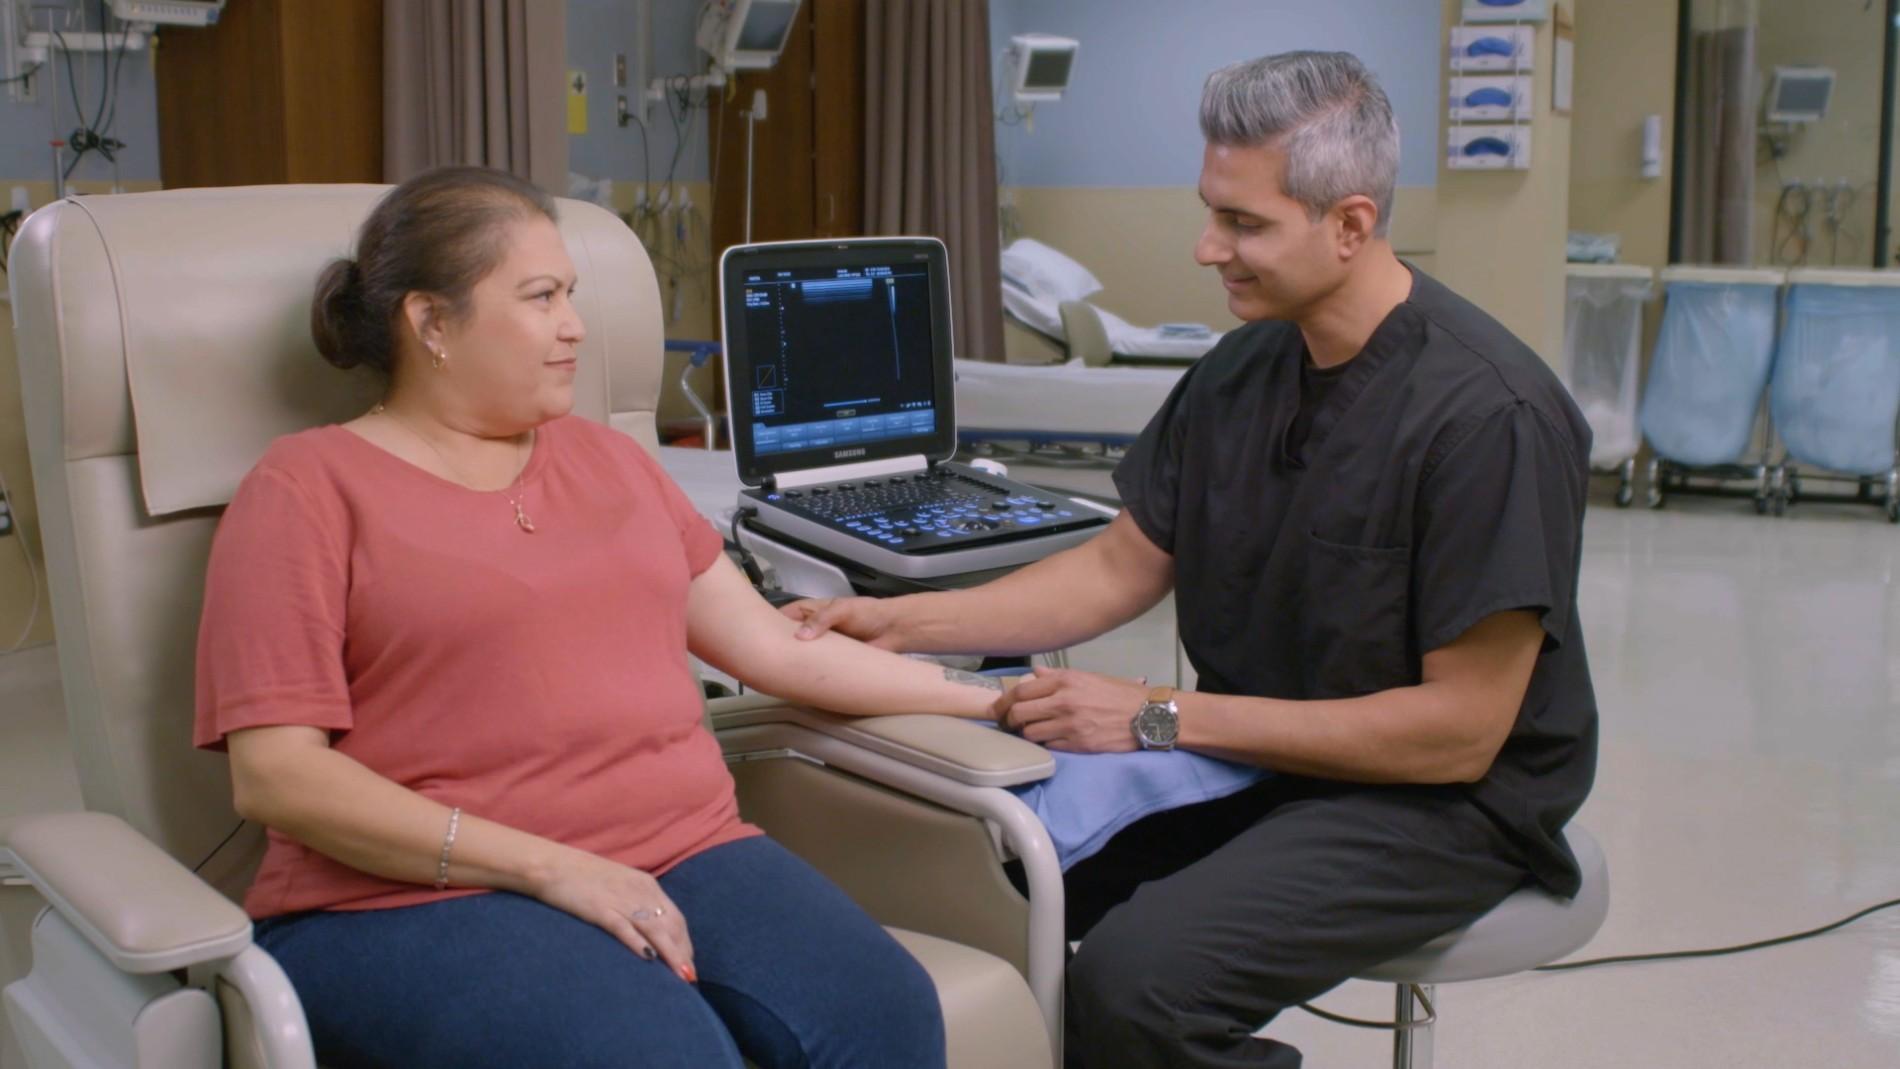 Nephrologist Umar Waheed checks the status of Ellipsys patient Theresa Torres' fistula using ultrasound.